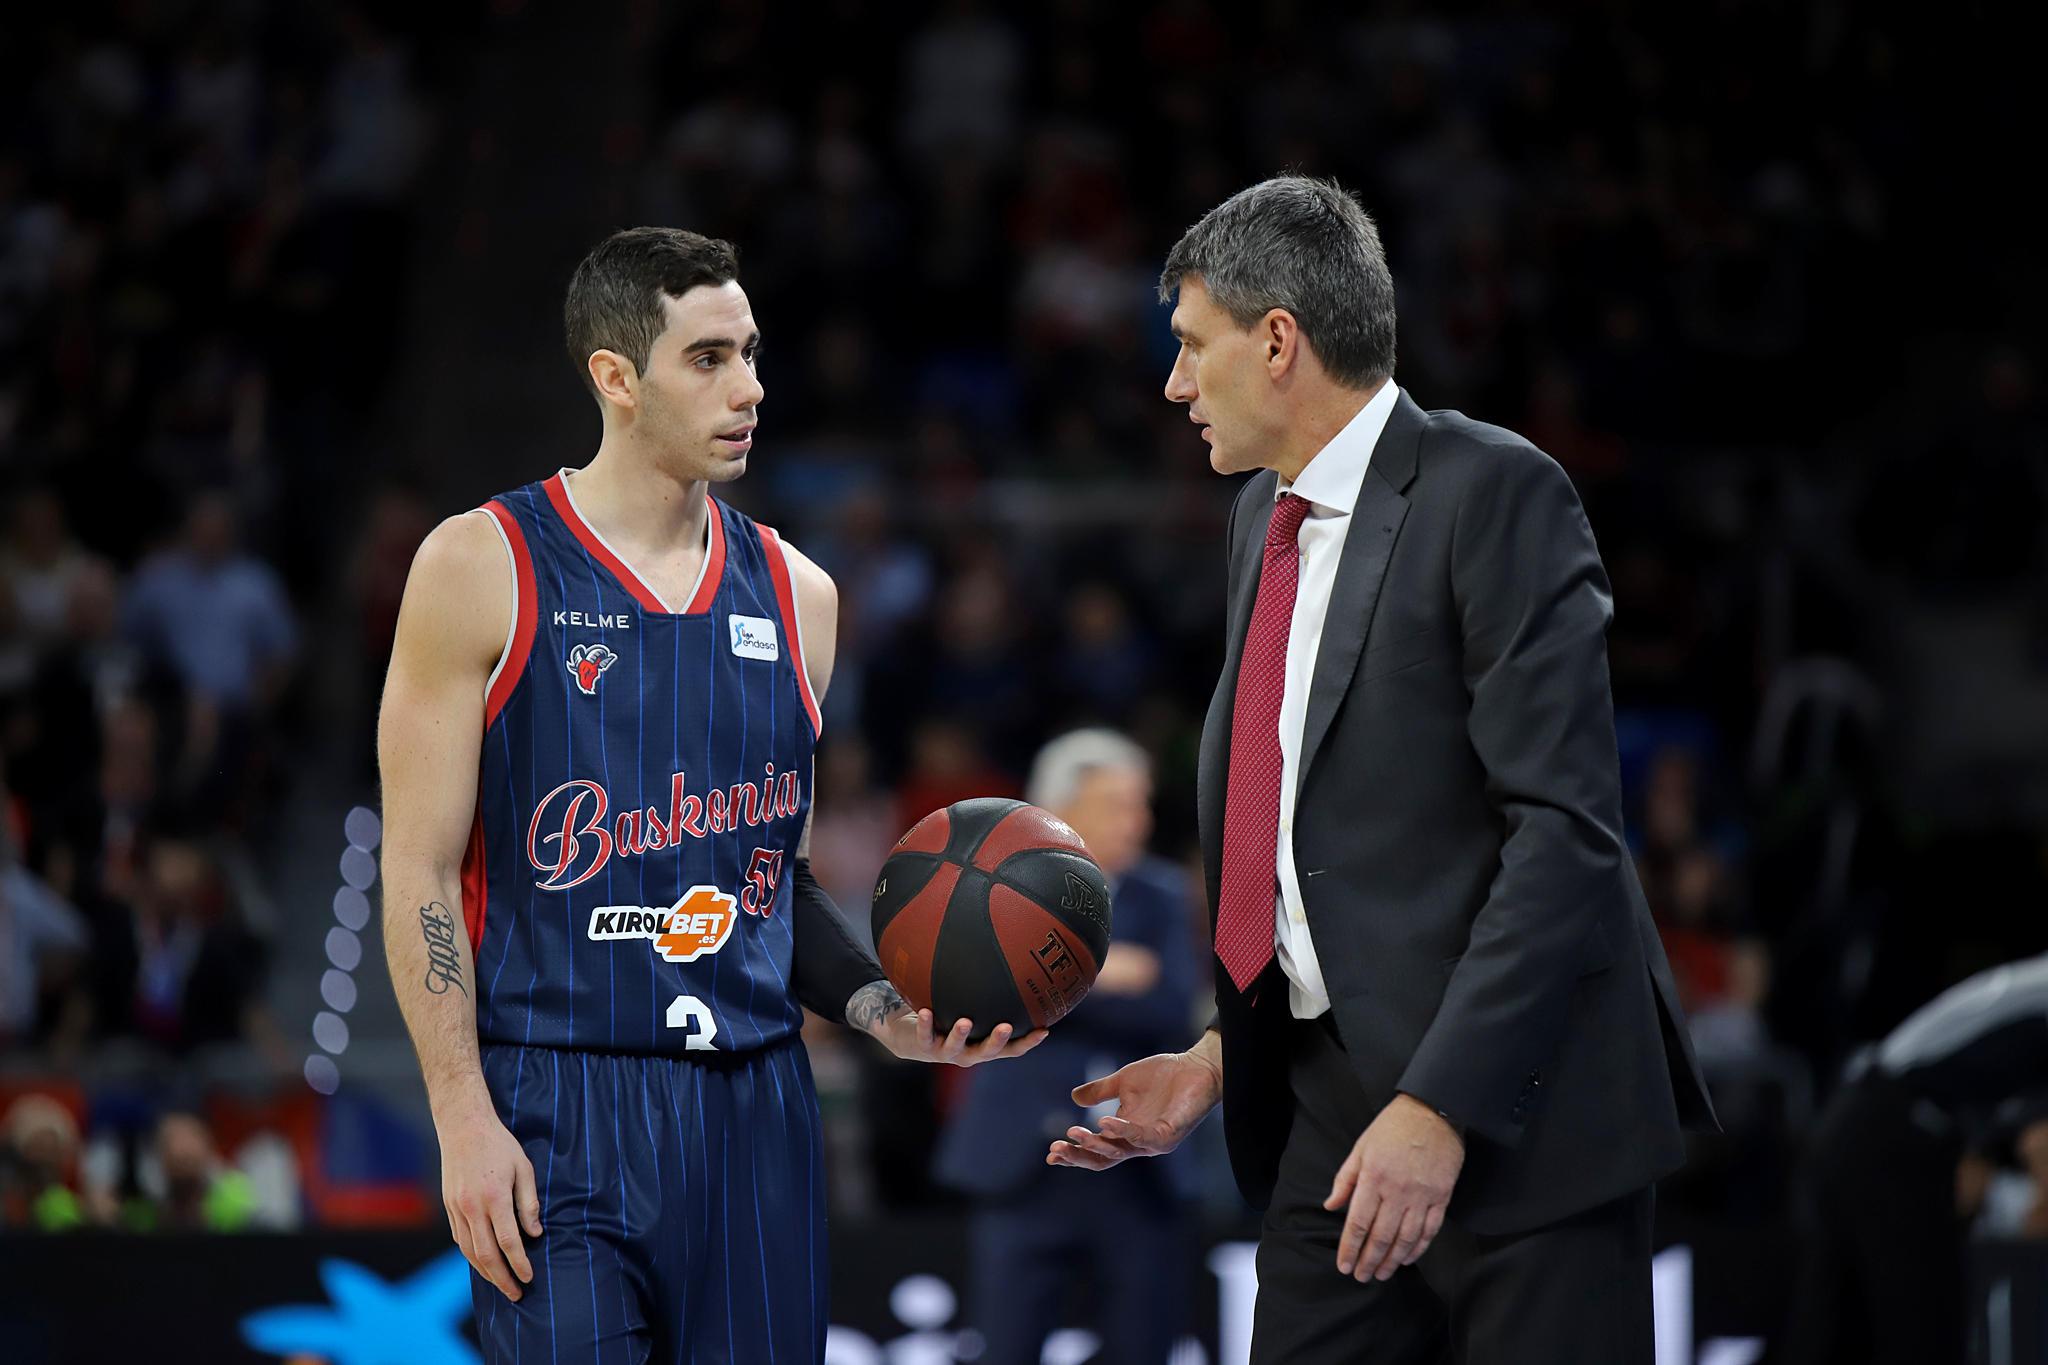 Luca Vildoza y Velimir Perasovic. Foto: Ekaitz Otxoa